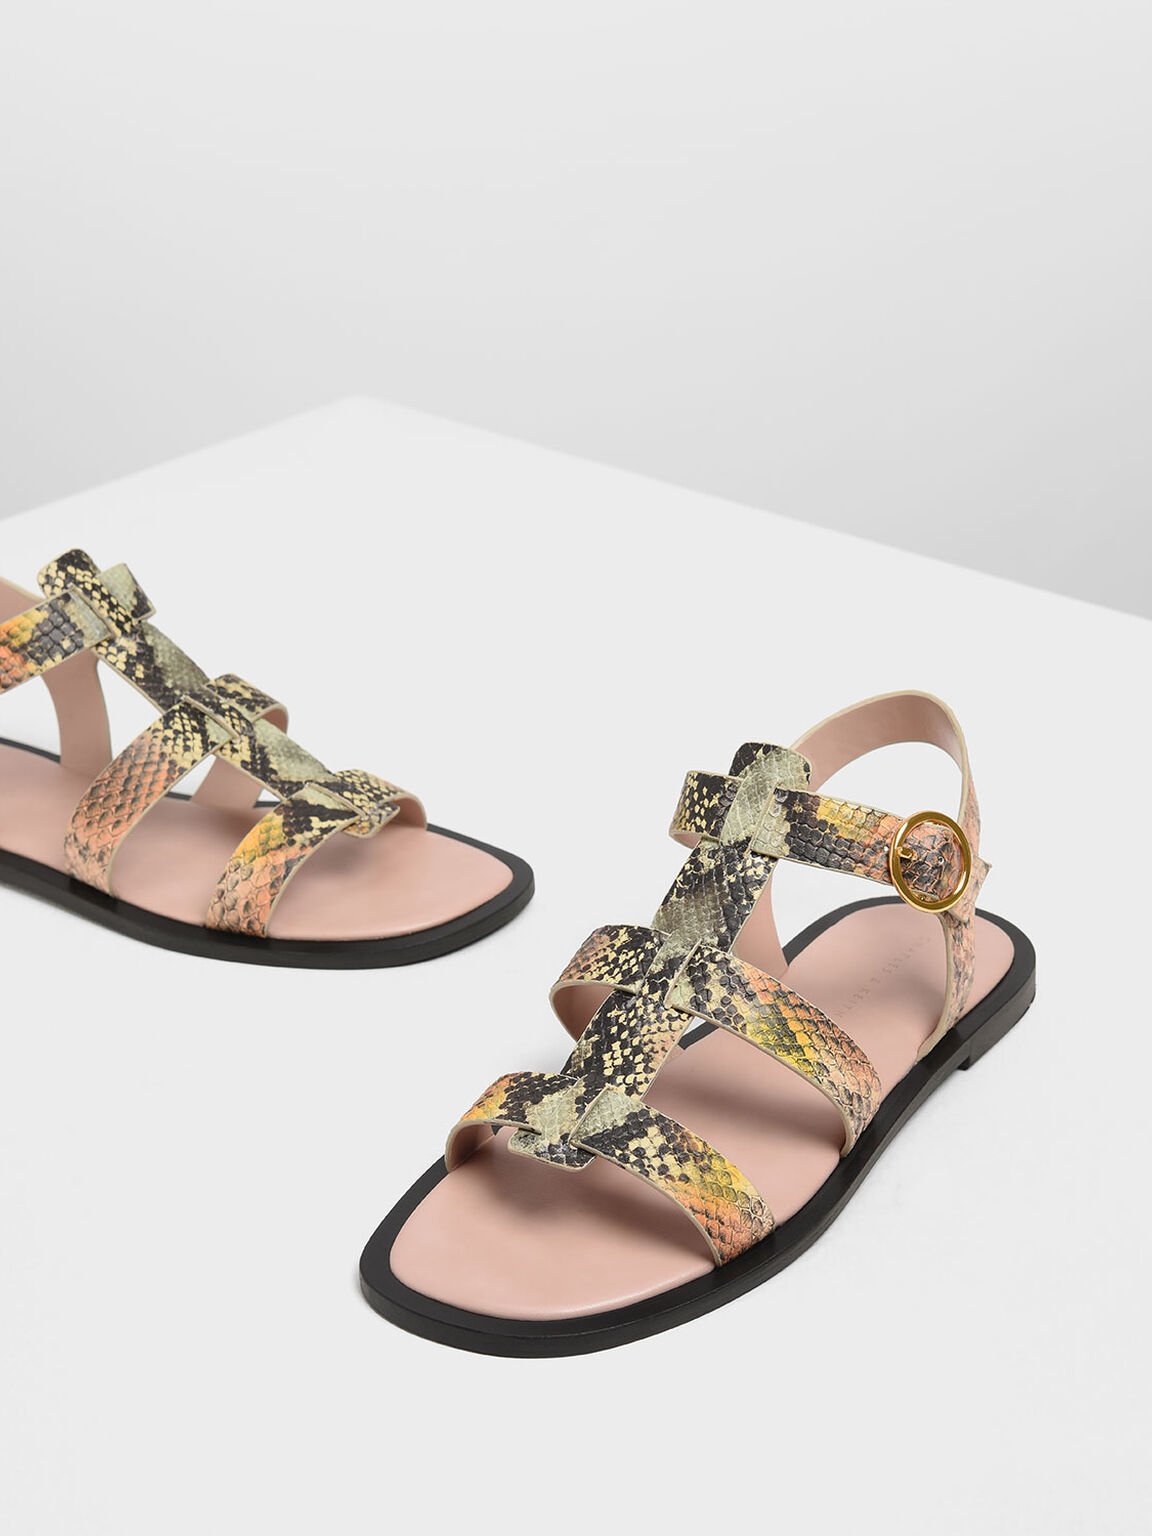 Snake Print Strappy Sandals, Multi, hi-res